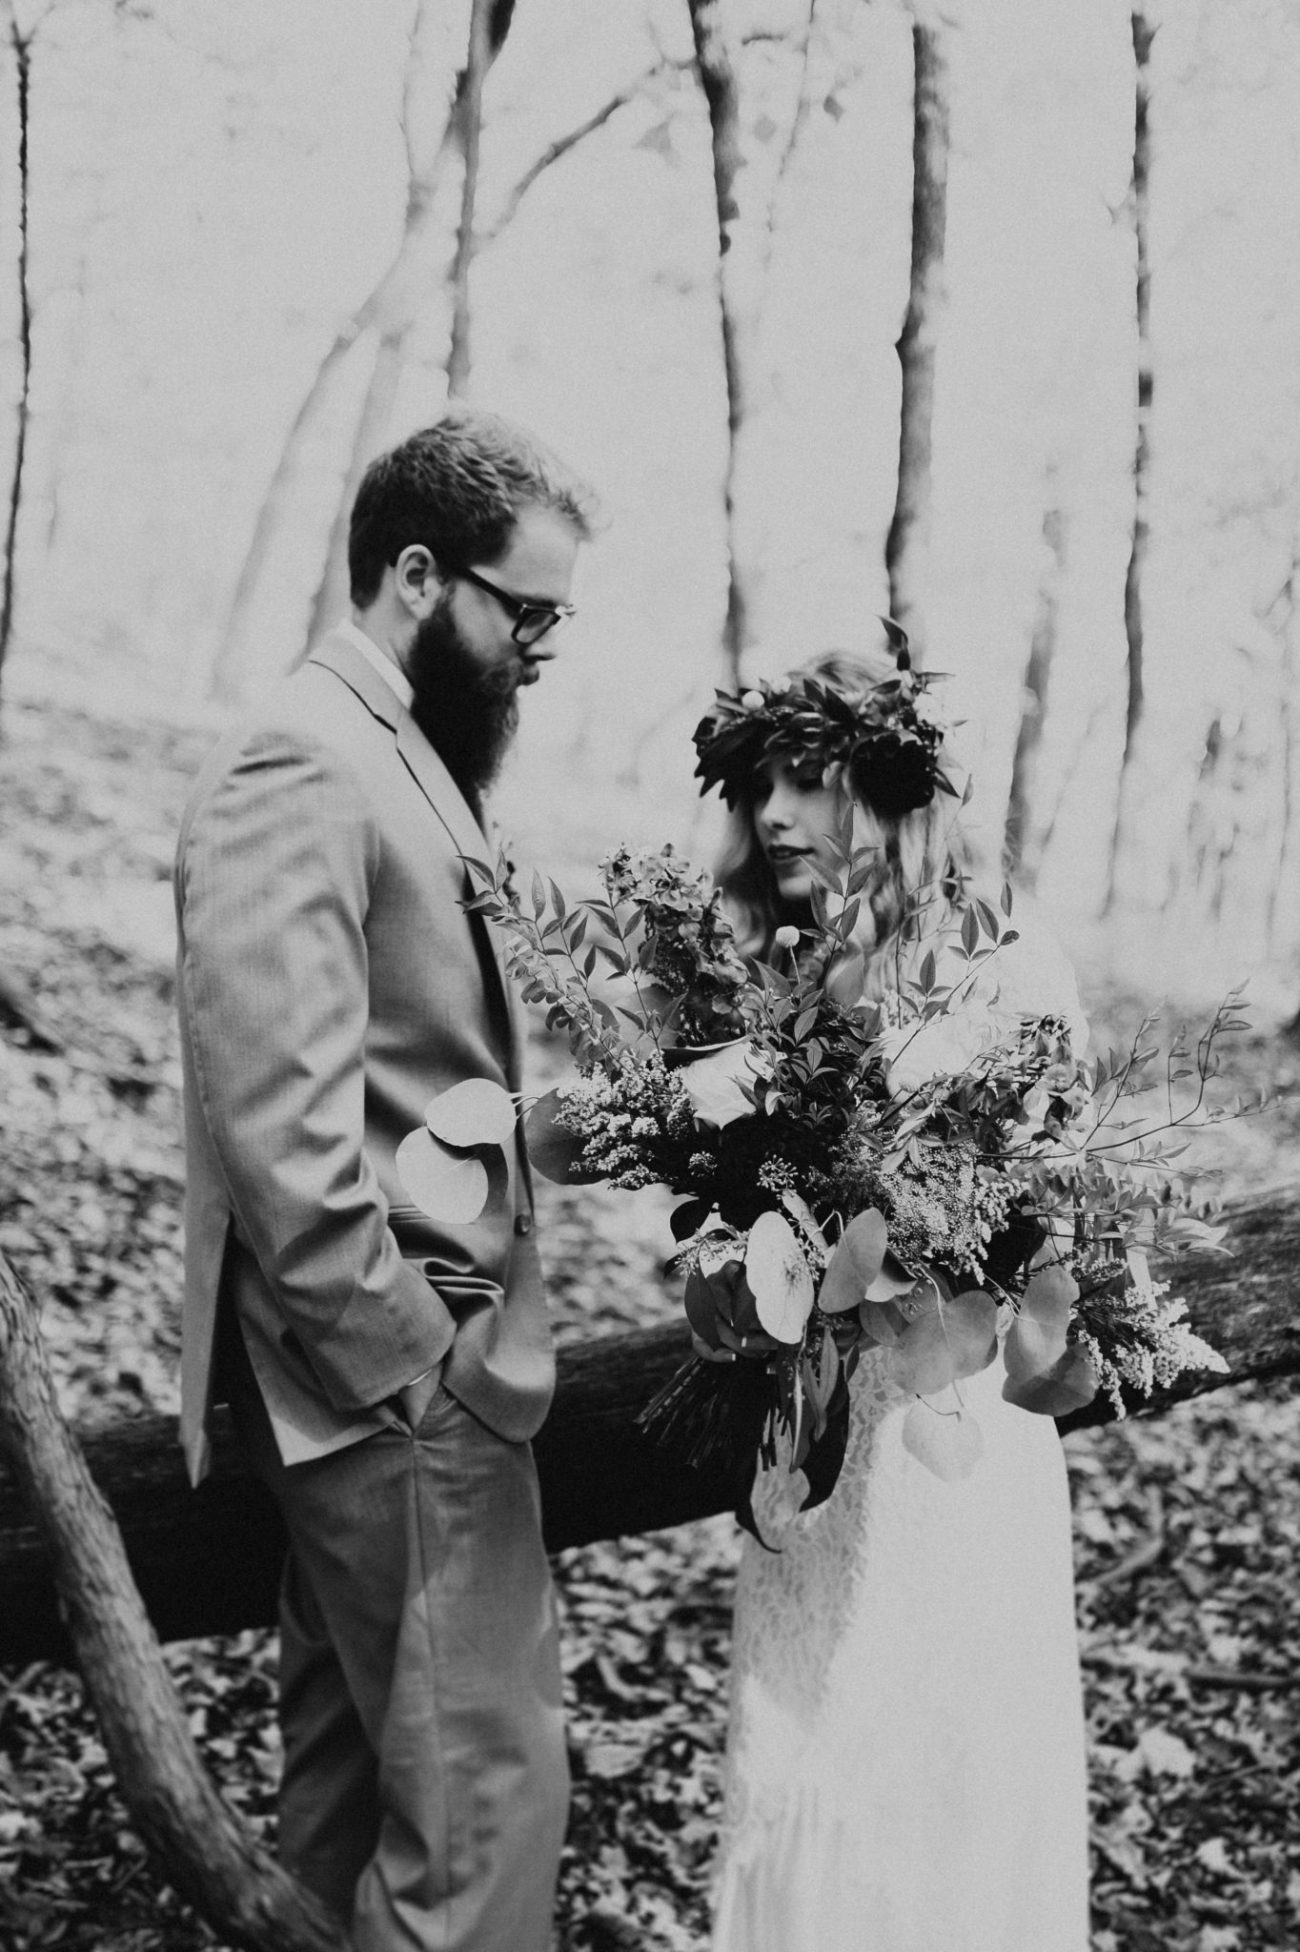 Spencer + Kate - Lauren F otography | Central Illinois Wedding